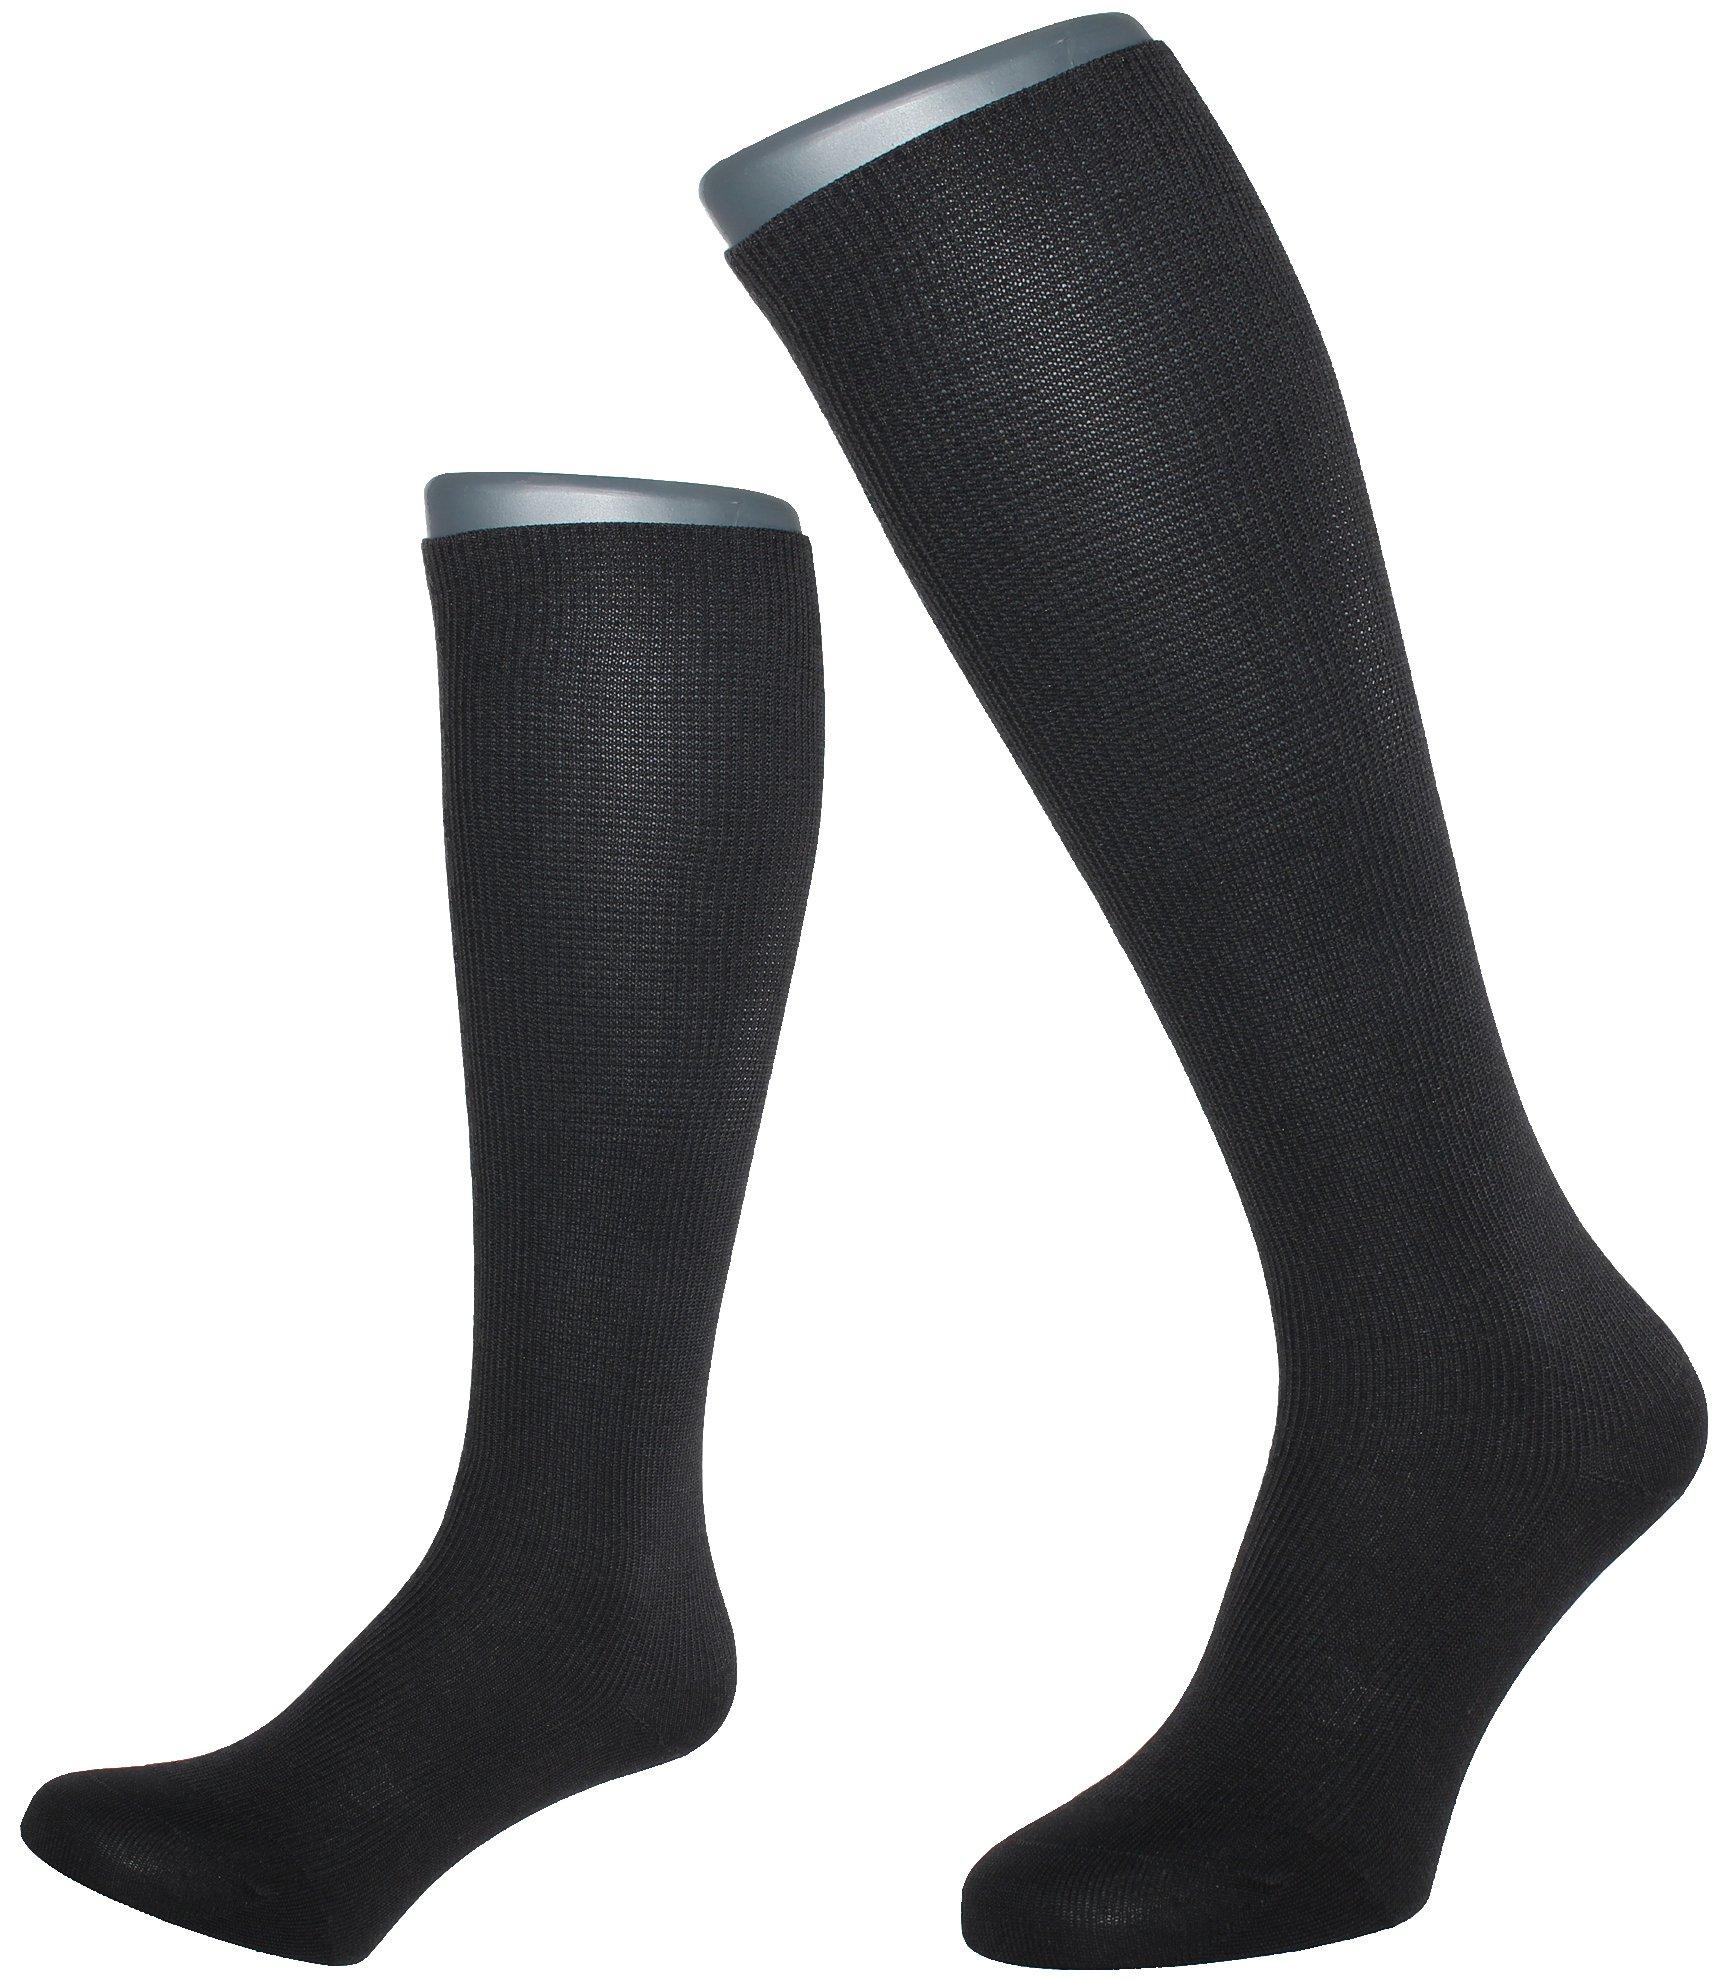 ALBERT KREUZ men's compression flight travel support knee-high socks 10,5 mmHg black EU 41-43 / US 8-10